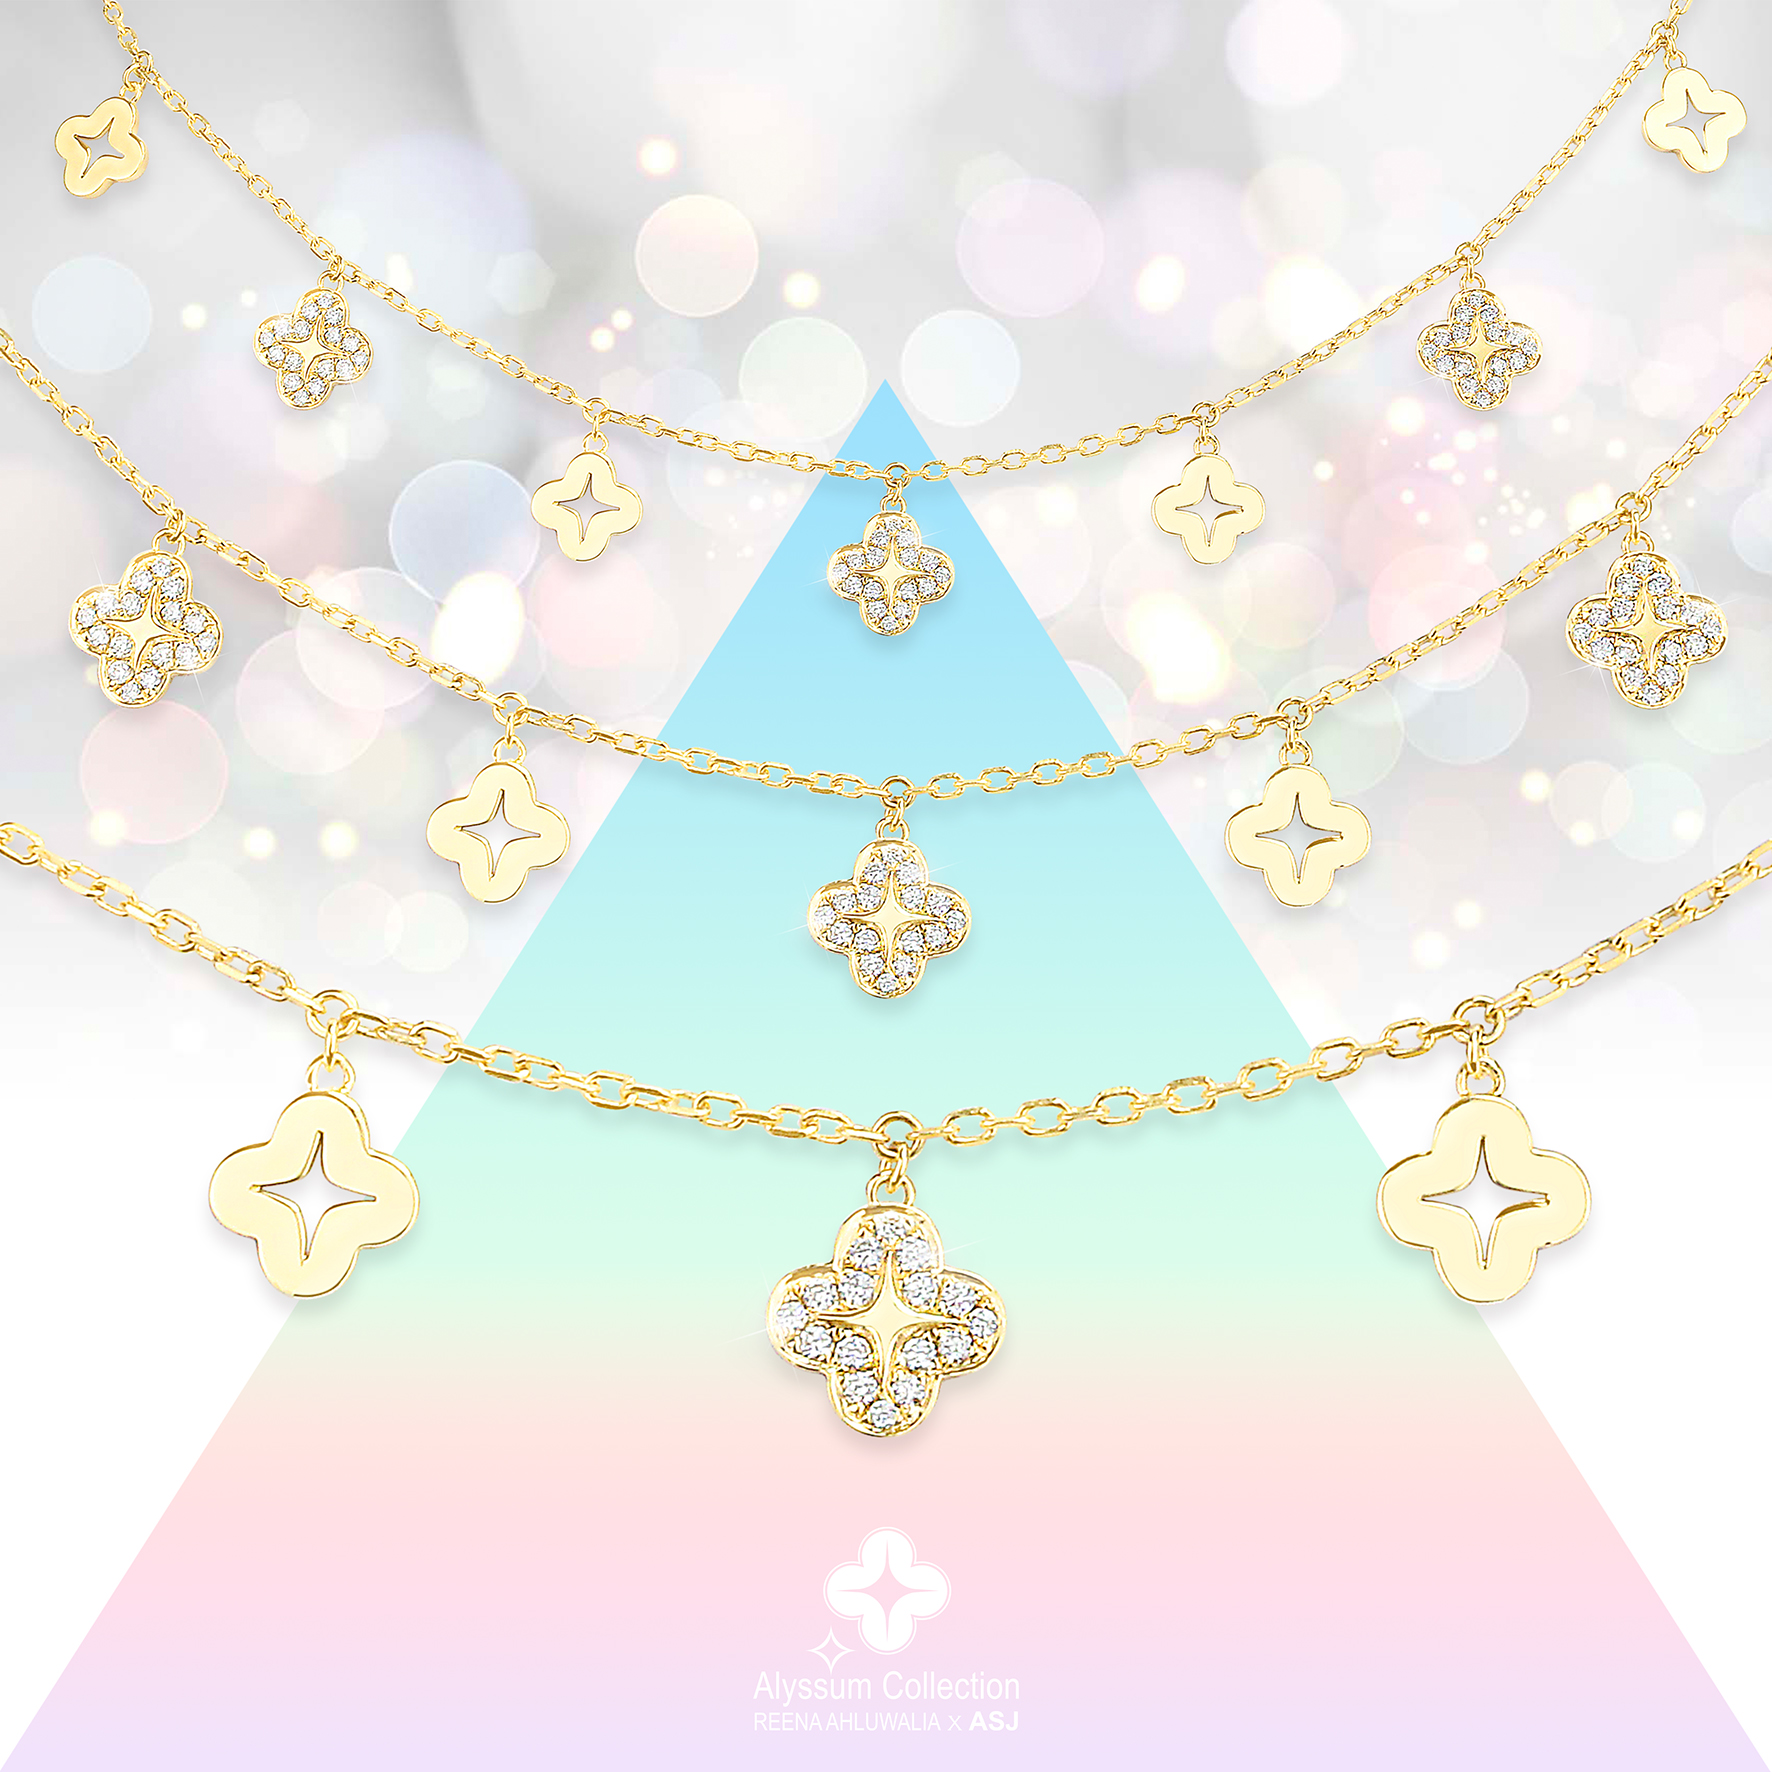 7Alyssum By Reena Ahluwalia_Diamonds_Gold_Collection.jpg